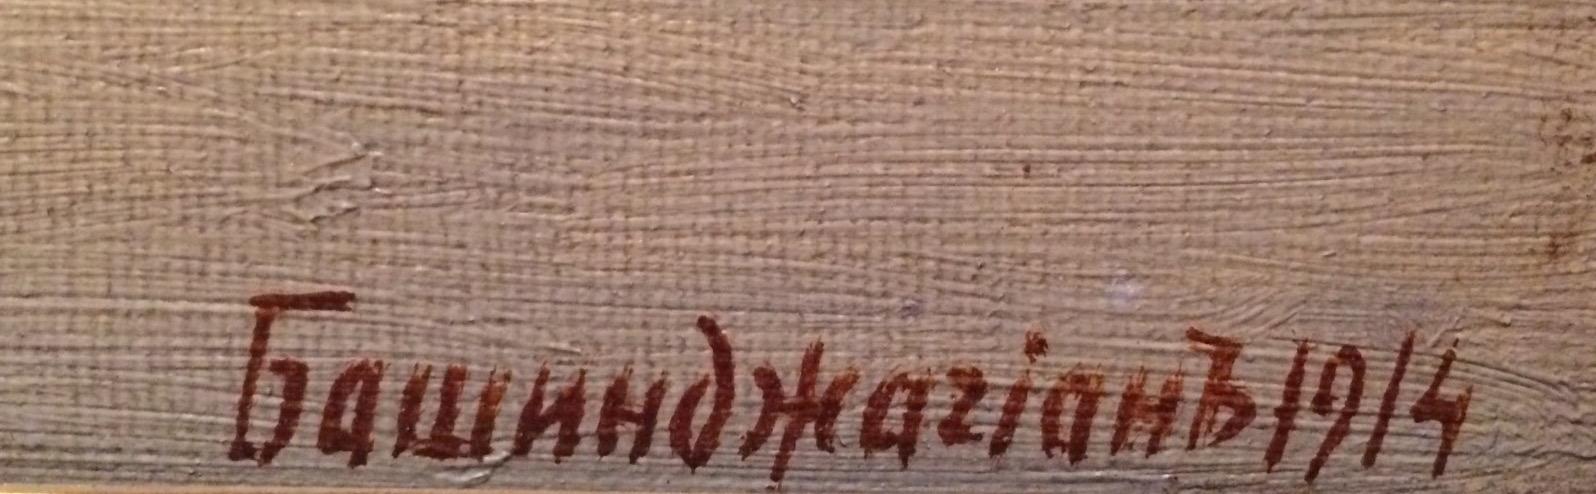 Подпись. Башинджагян Геворк Захарович. Вид на гору Арарат.